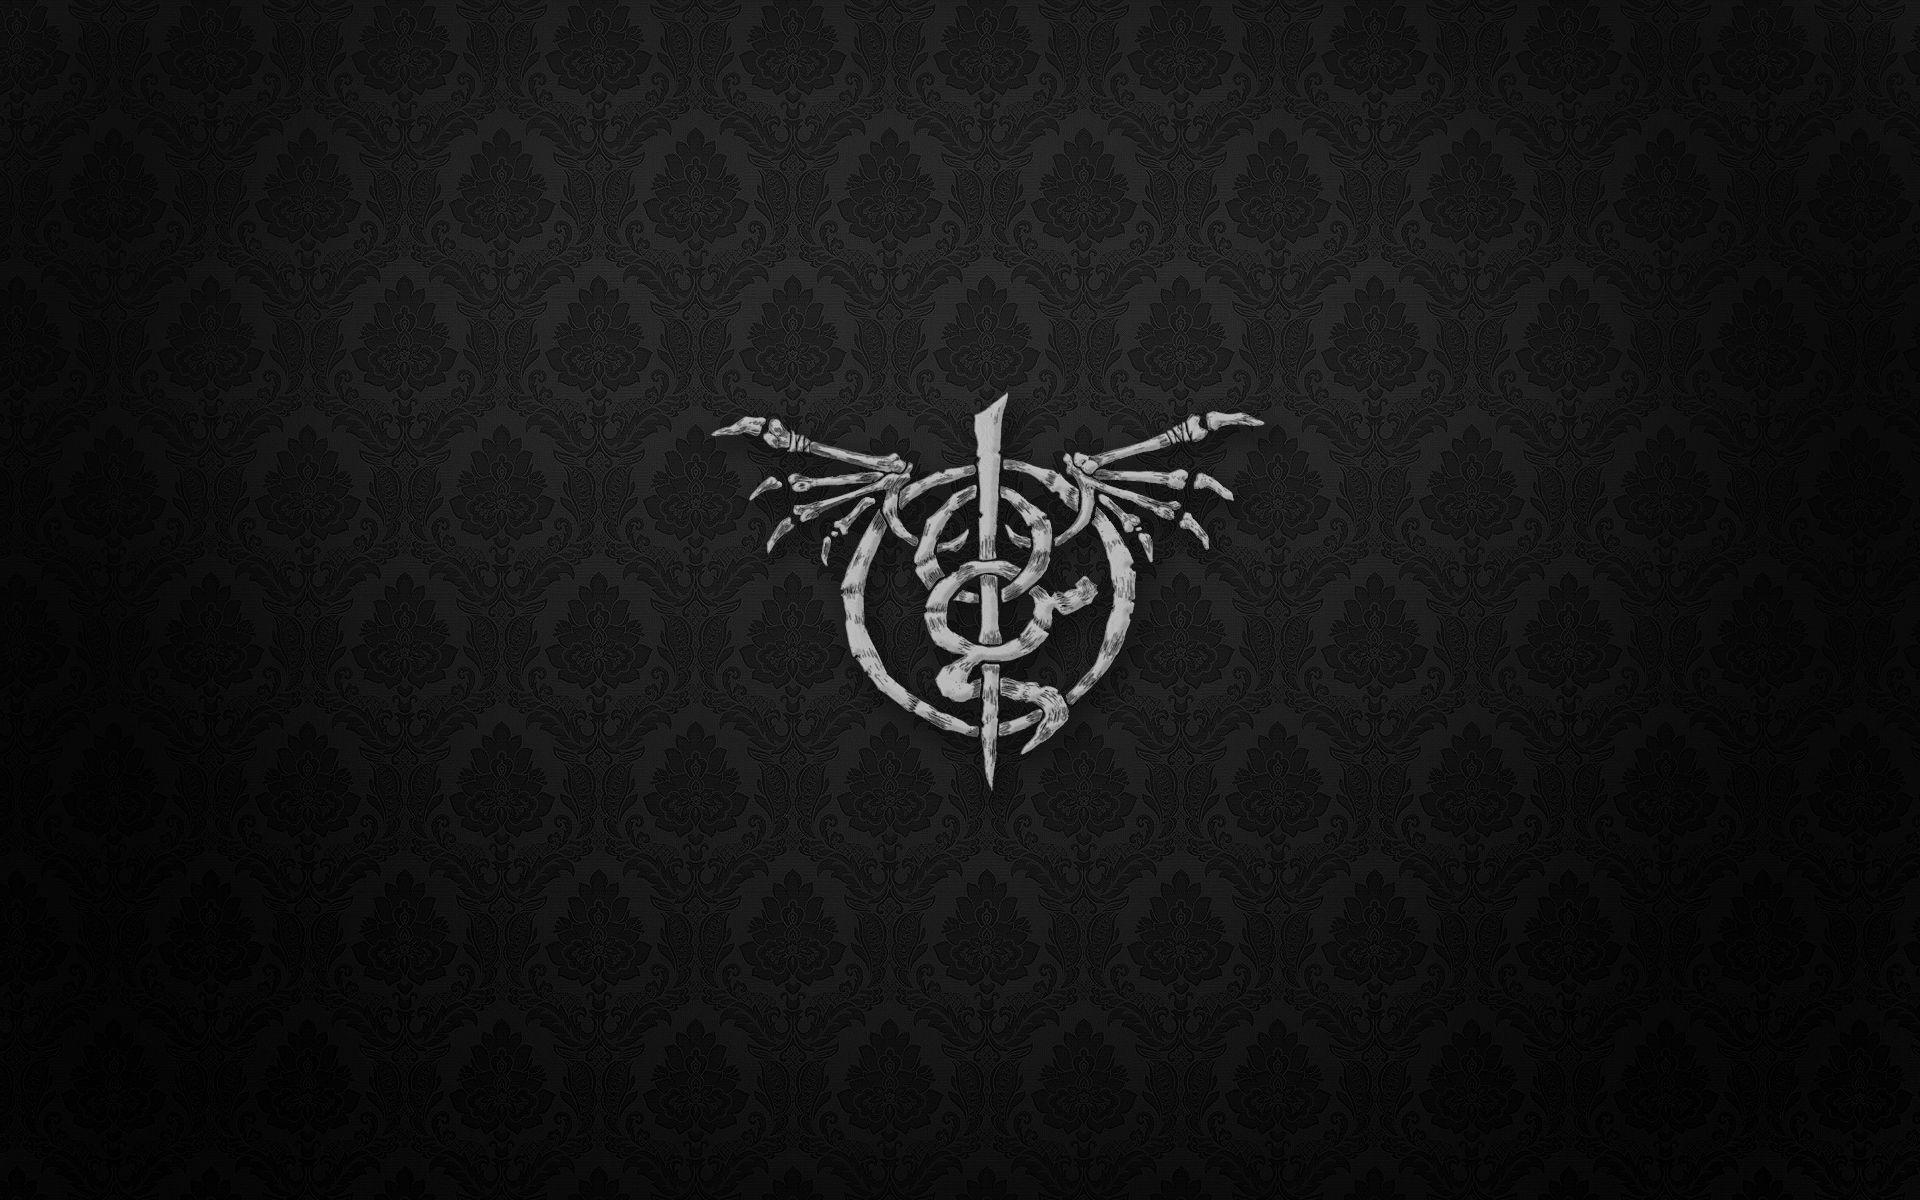 Metal Band Logo Wallpapers Wallpaper Cave